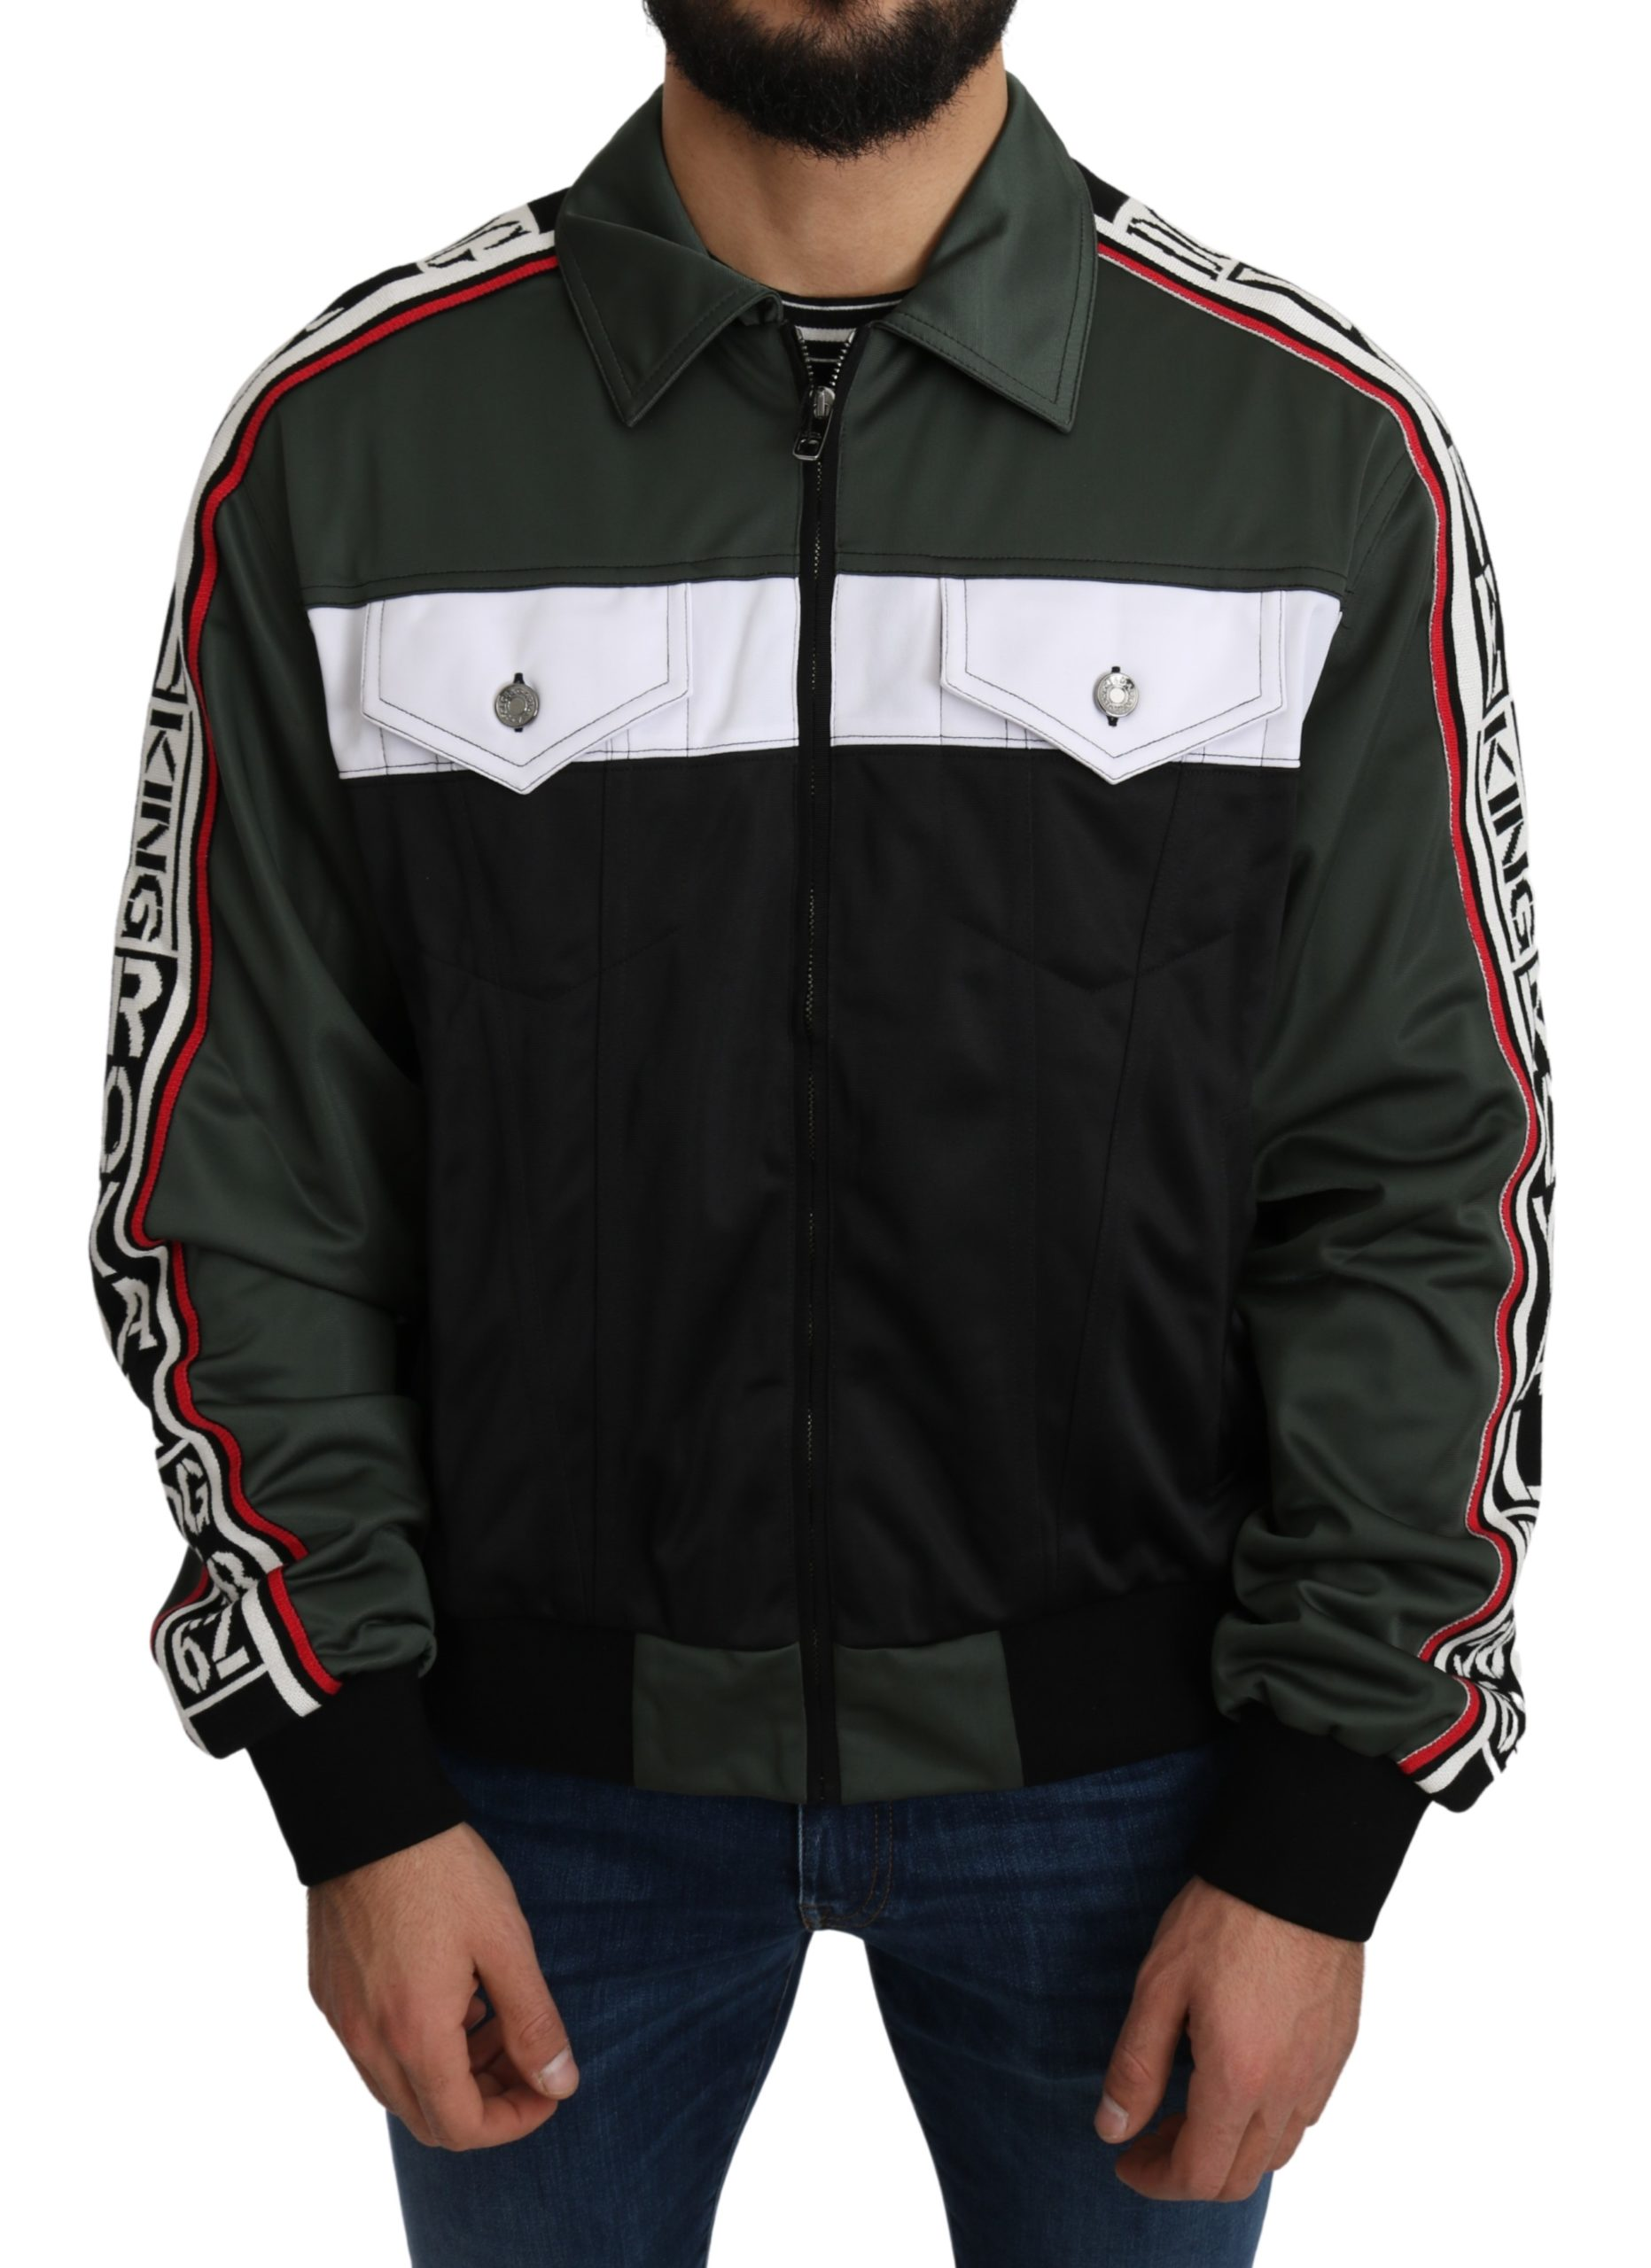 Dolce & Gabbana Men's DG KING Logo Stripe Jacket Green JKT2645 - IT50   L